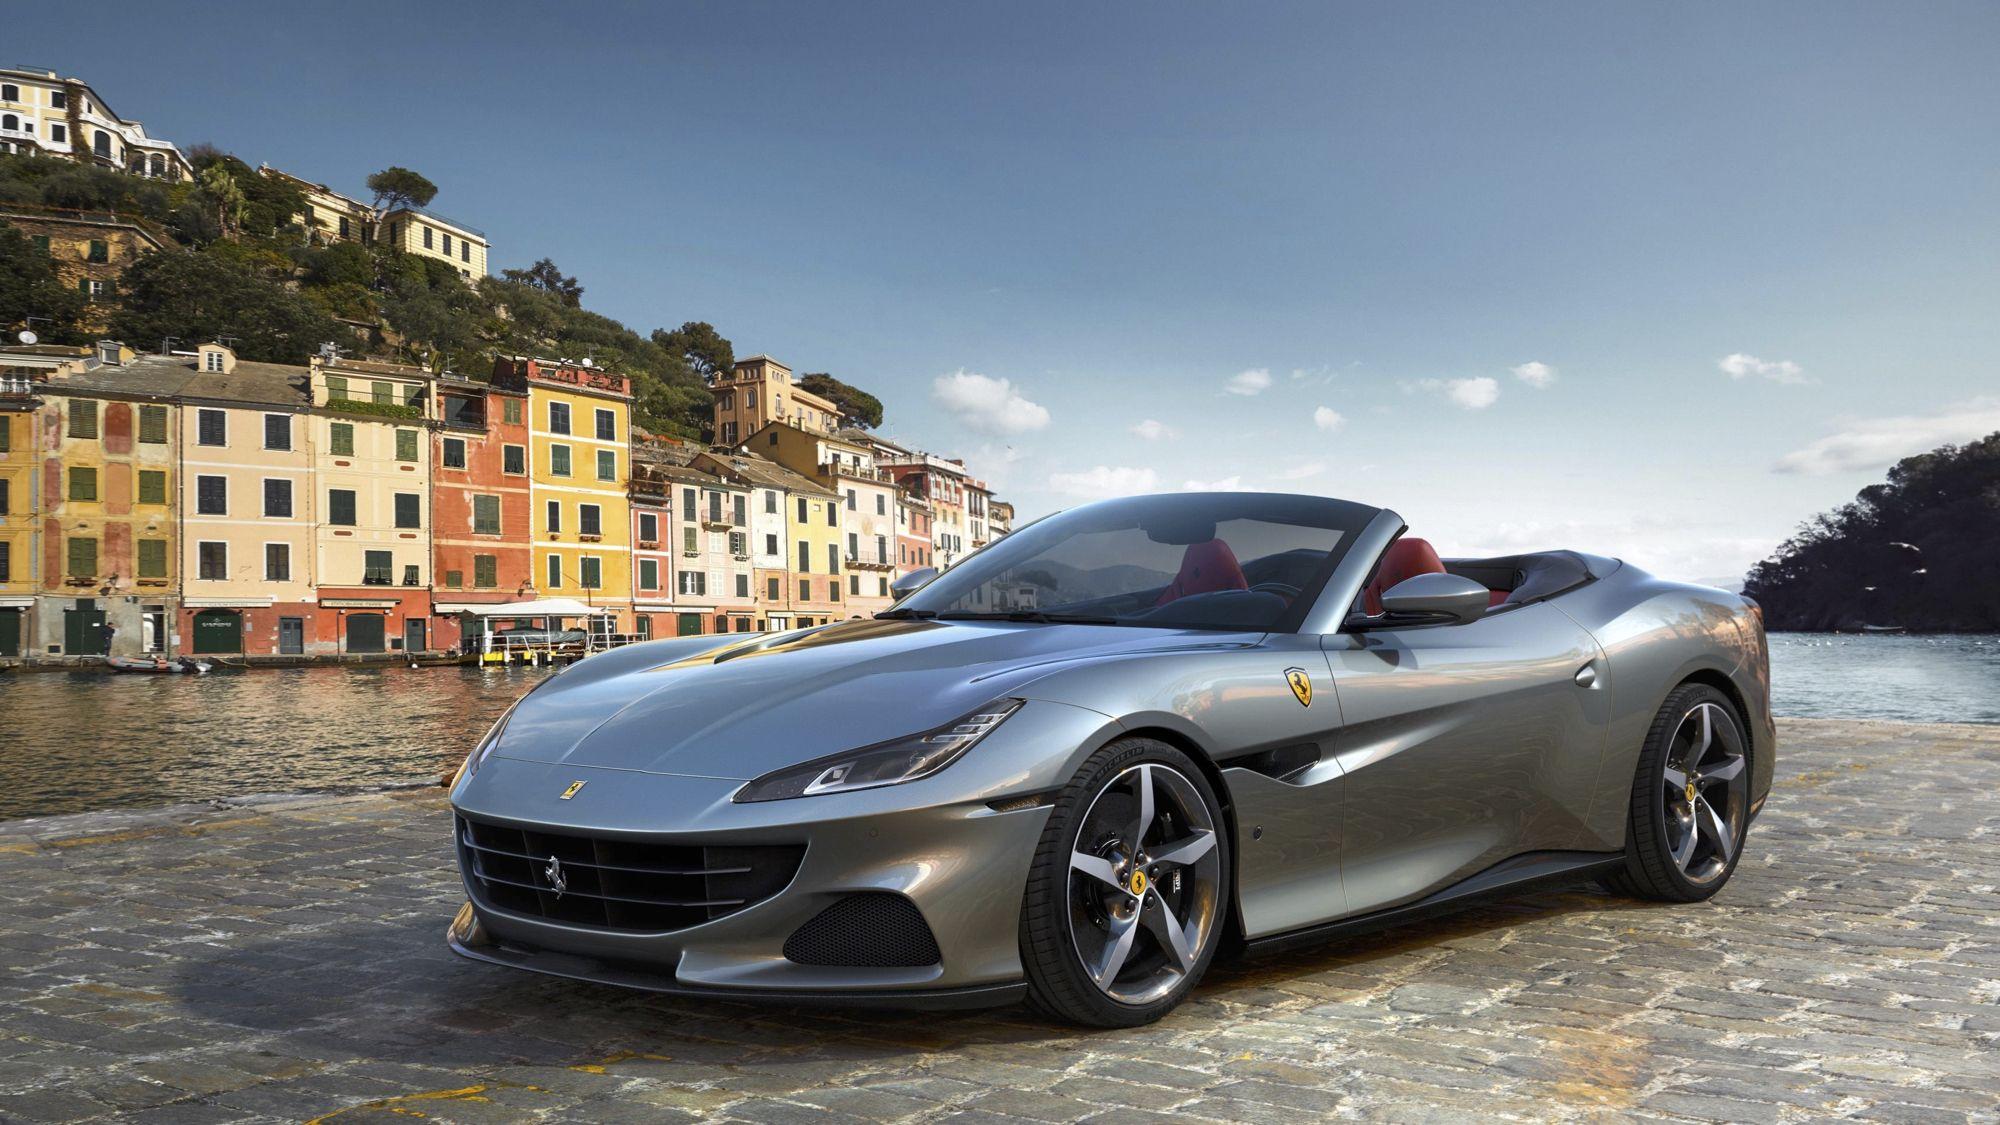 Ferrari Reveals An Updated Two Plus Two Seater Gt The Portofino M